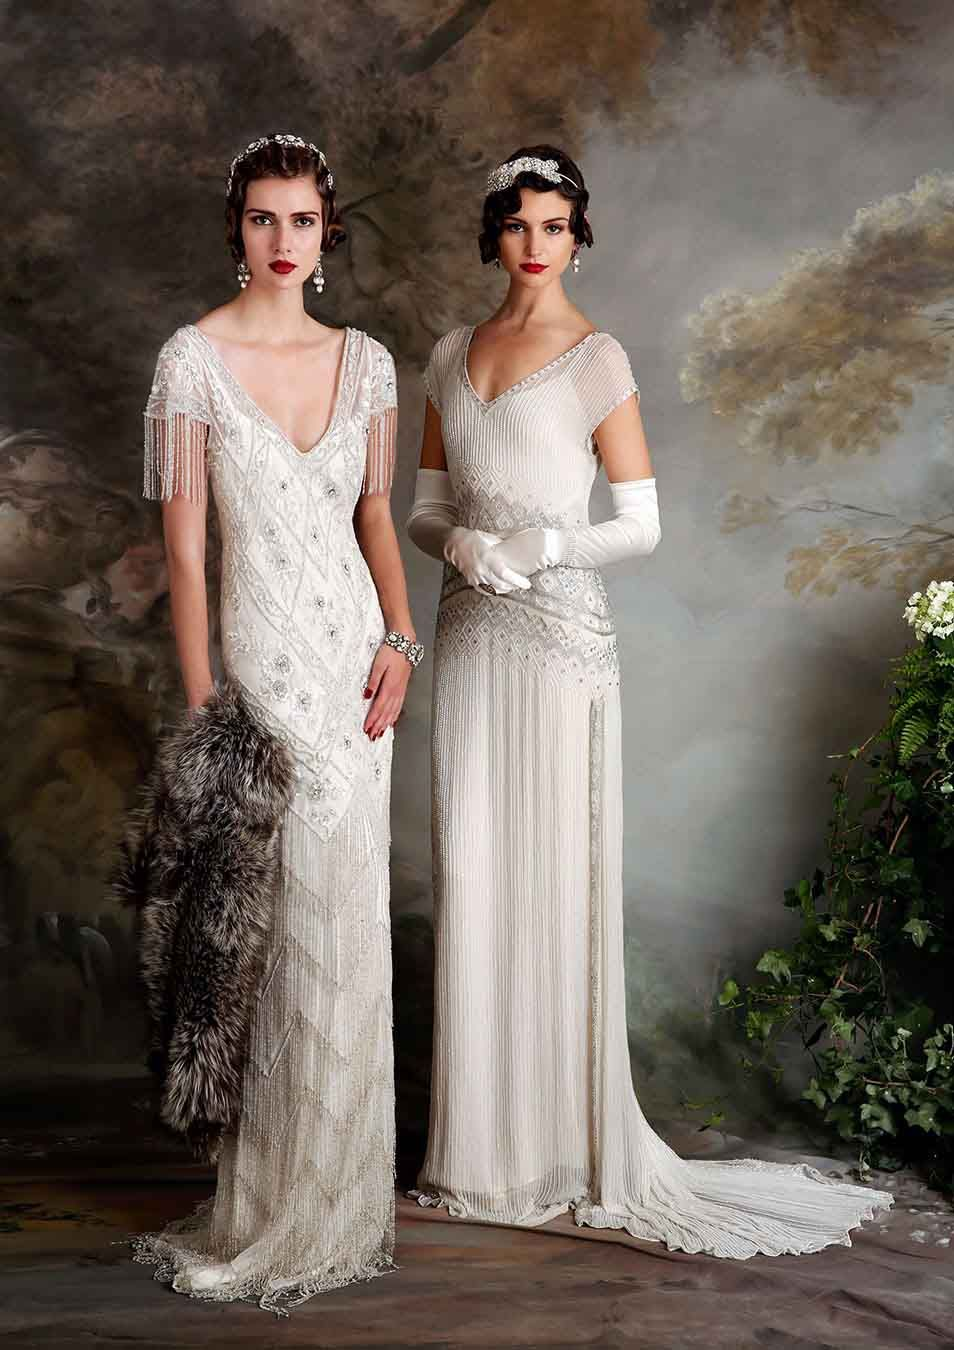 1920 wedding dress  Eliza Jane Howell Wedding Dresses  Debutante Collection   Eliza